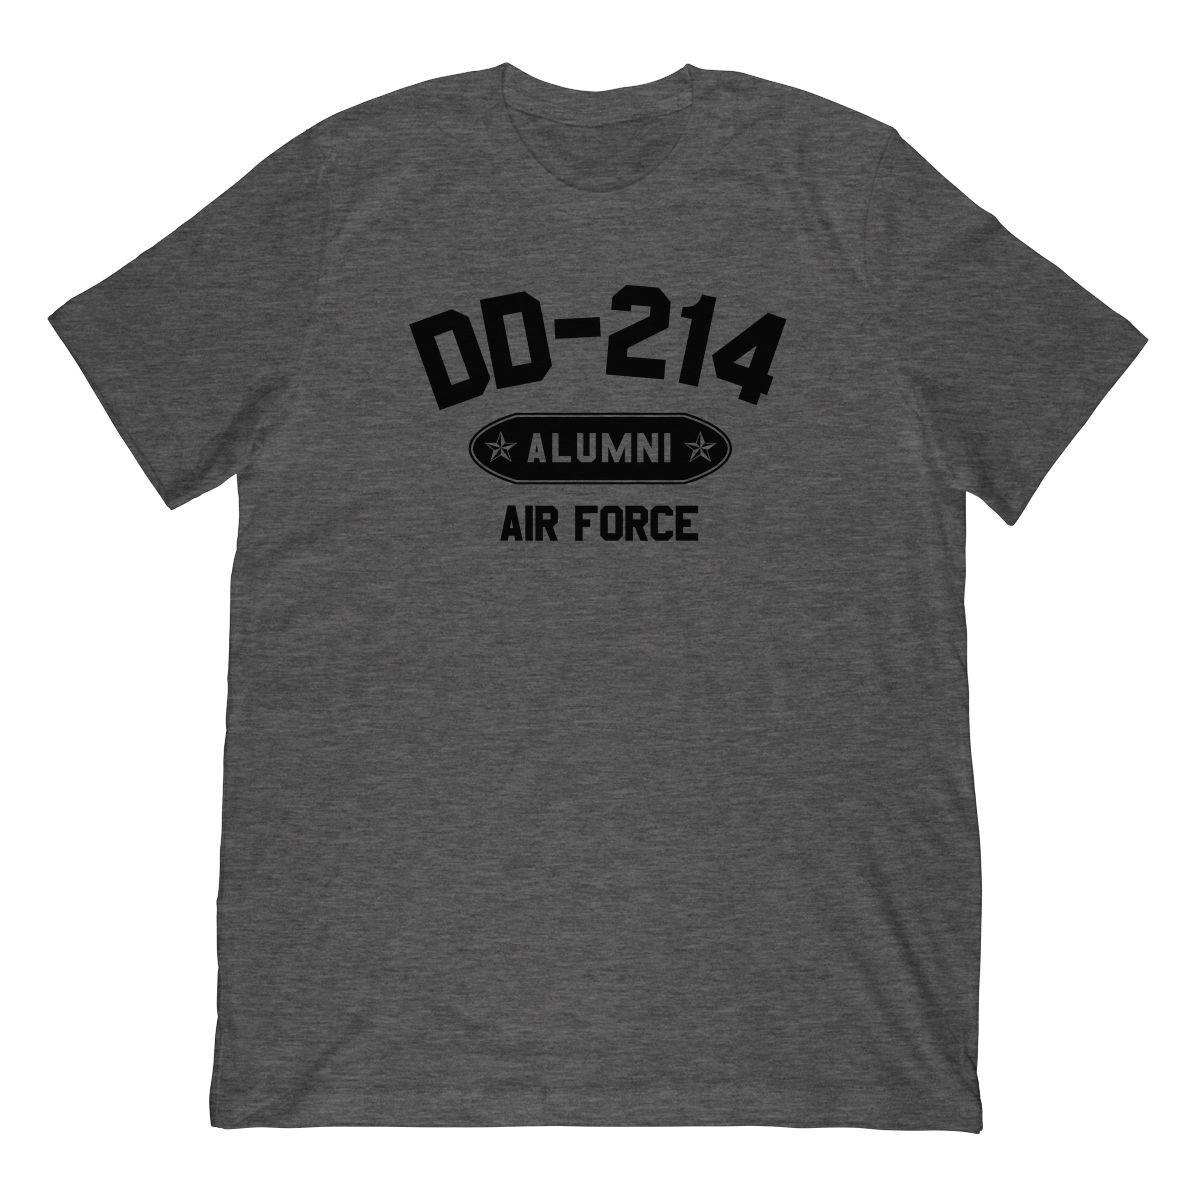 DD-214 Alumni Air Force In Black (Stamp Look) T-Shirt